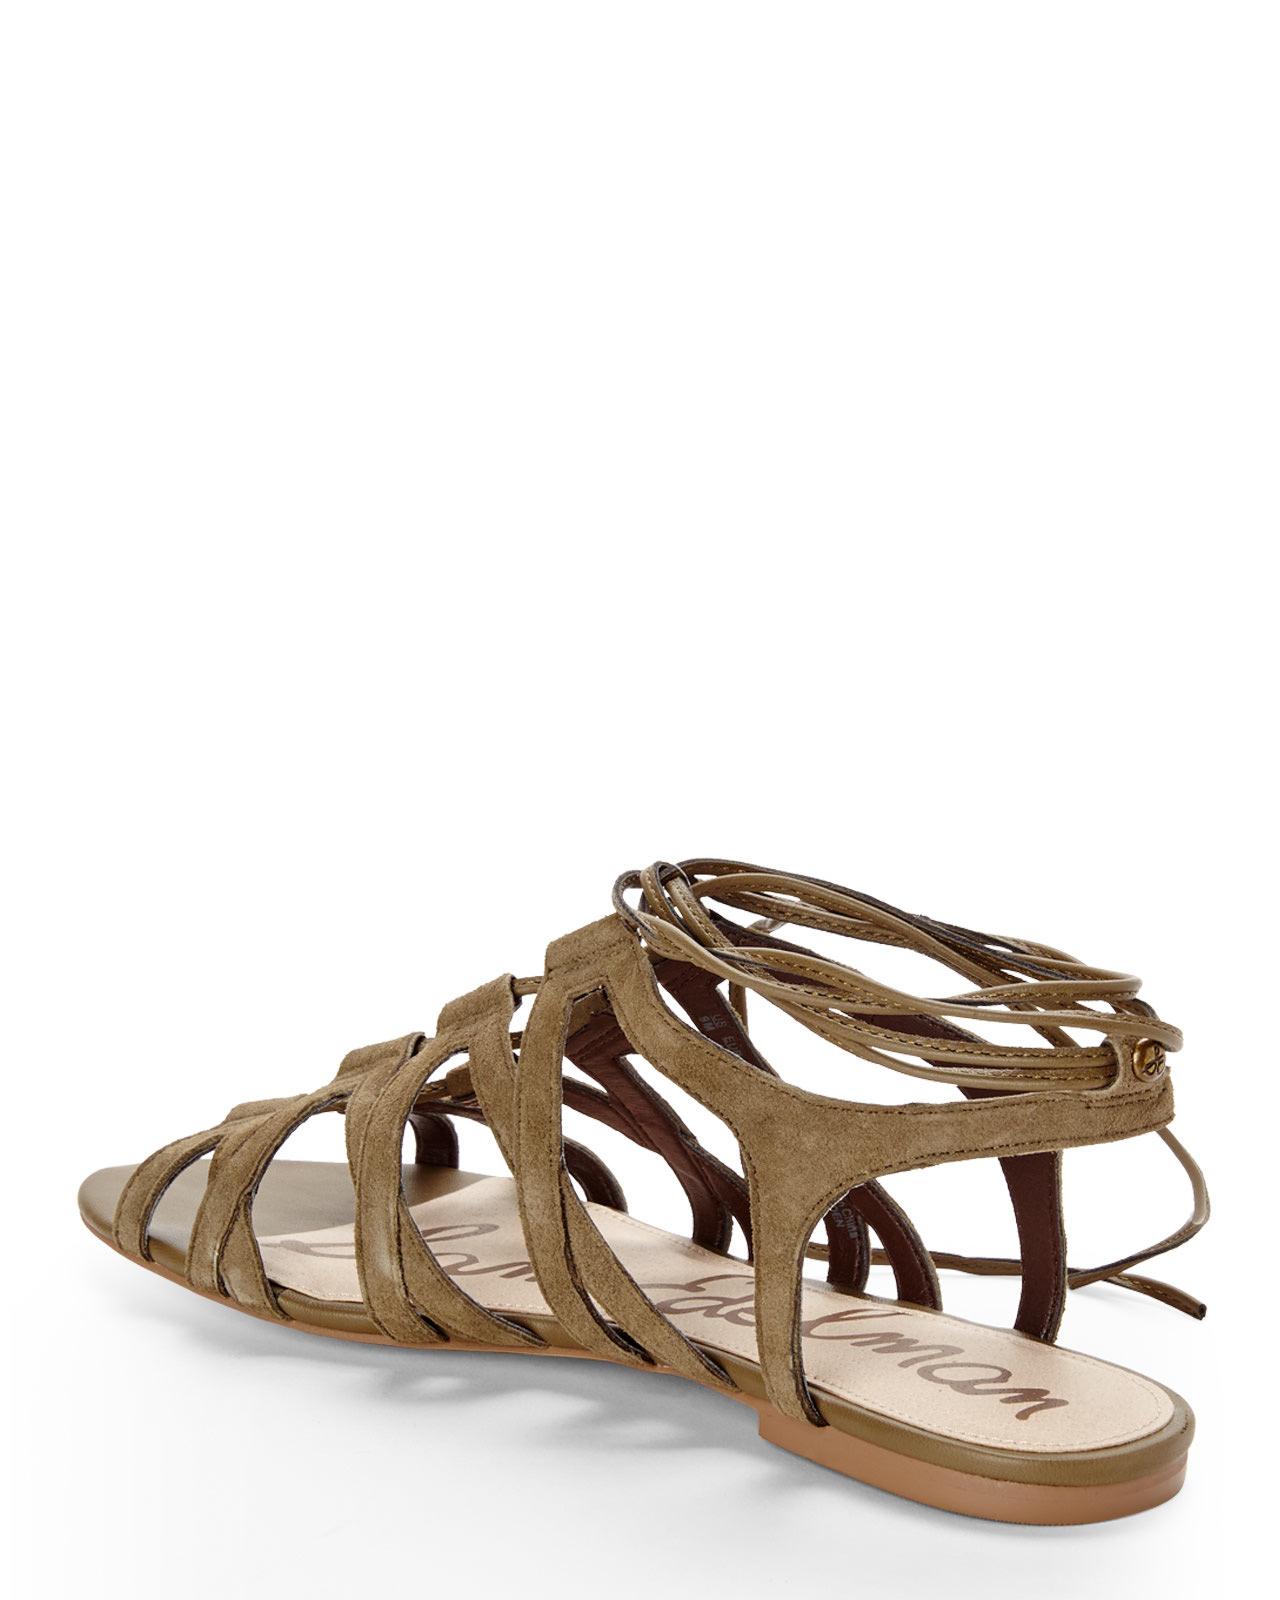 b55cd28407308 Lyst - Sam Edelman Green Boyden Gladiator Sandals in Green